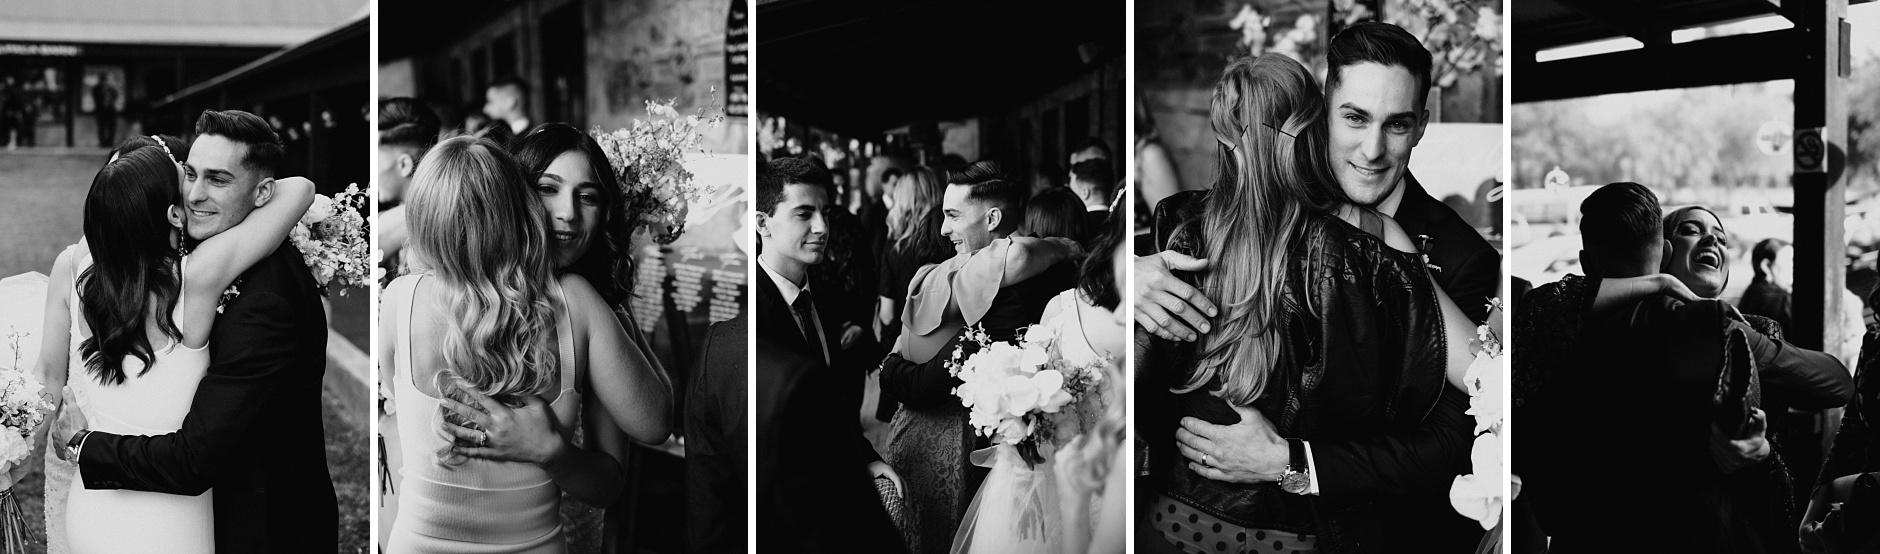 cassandra&cameron0542ab_Peppers-Creek-Wedding.jpg